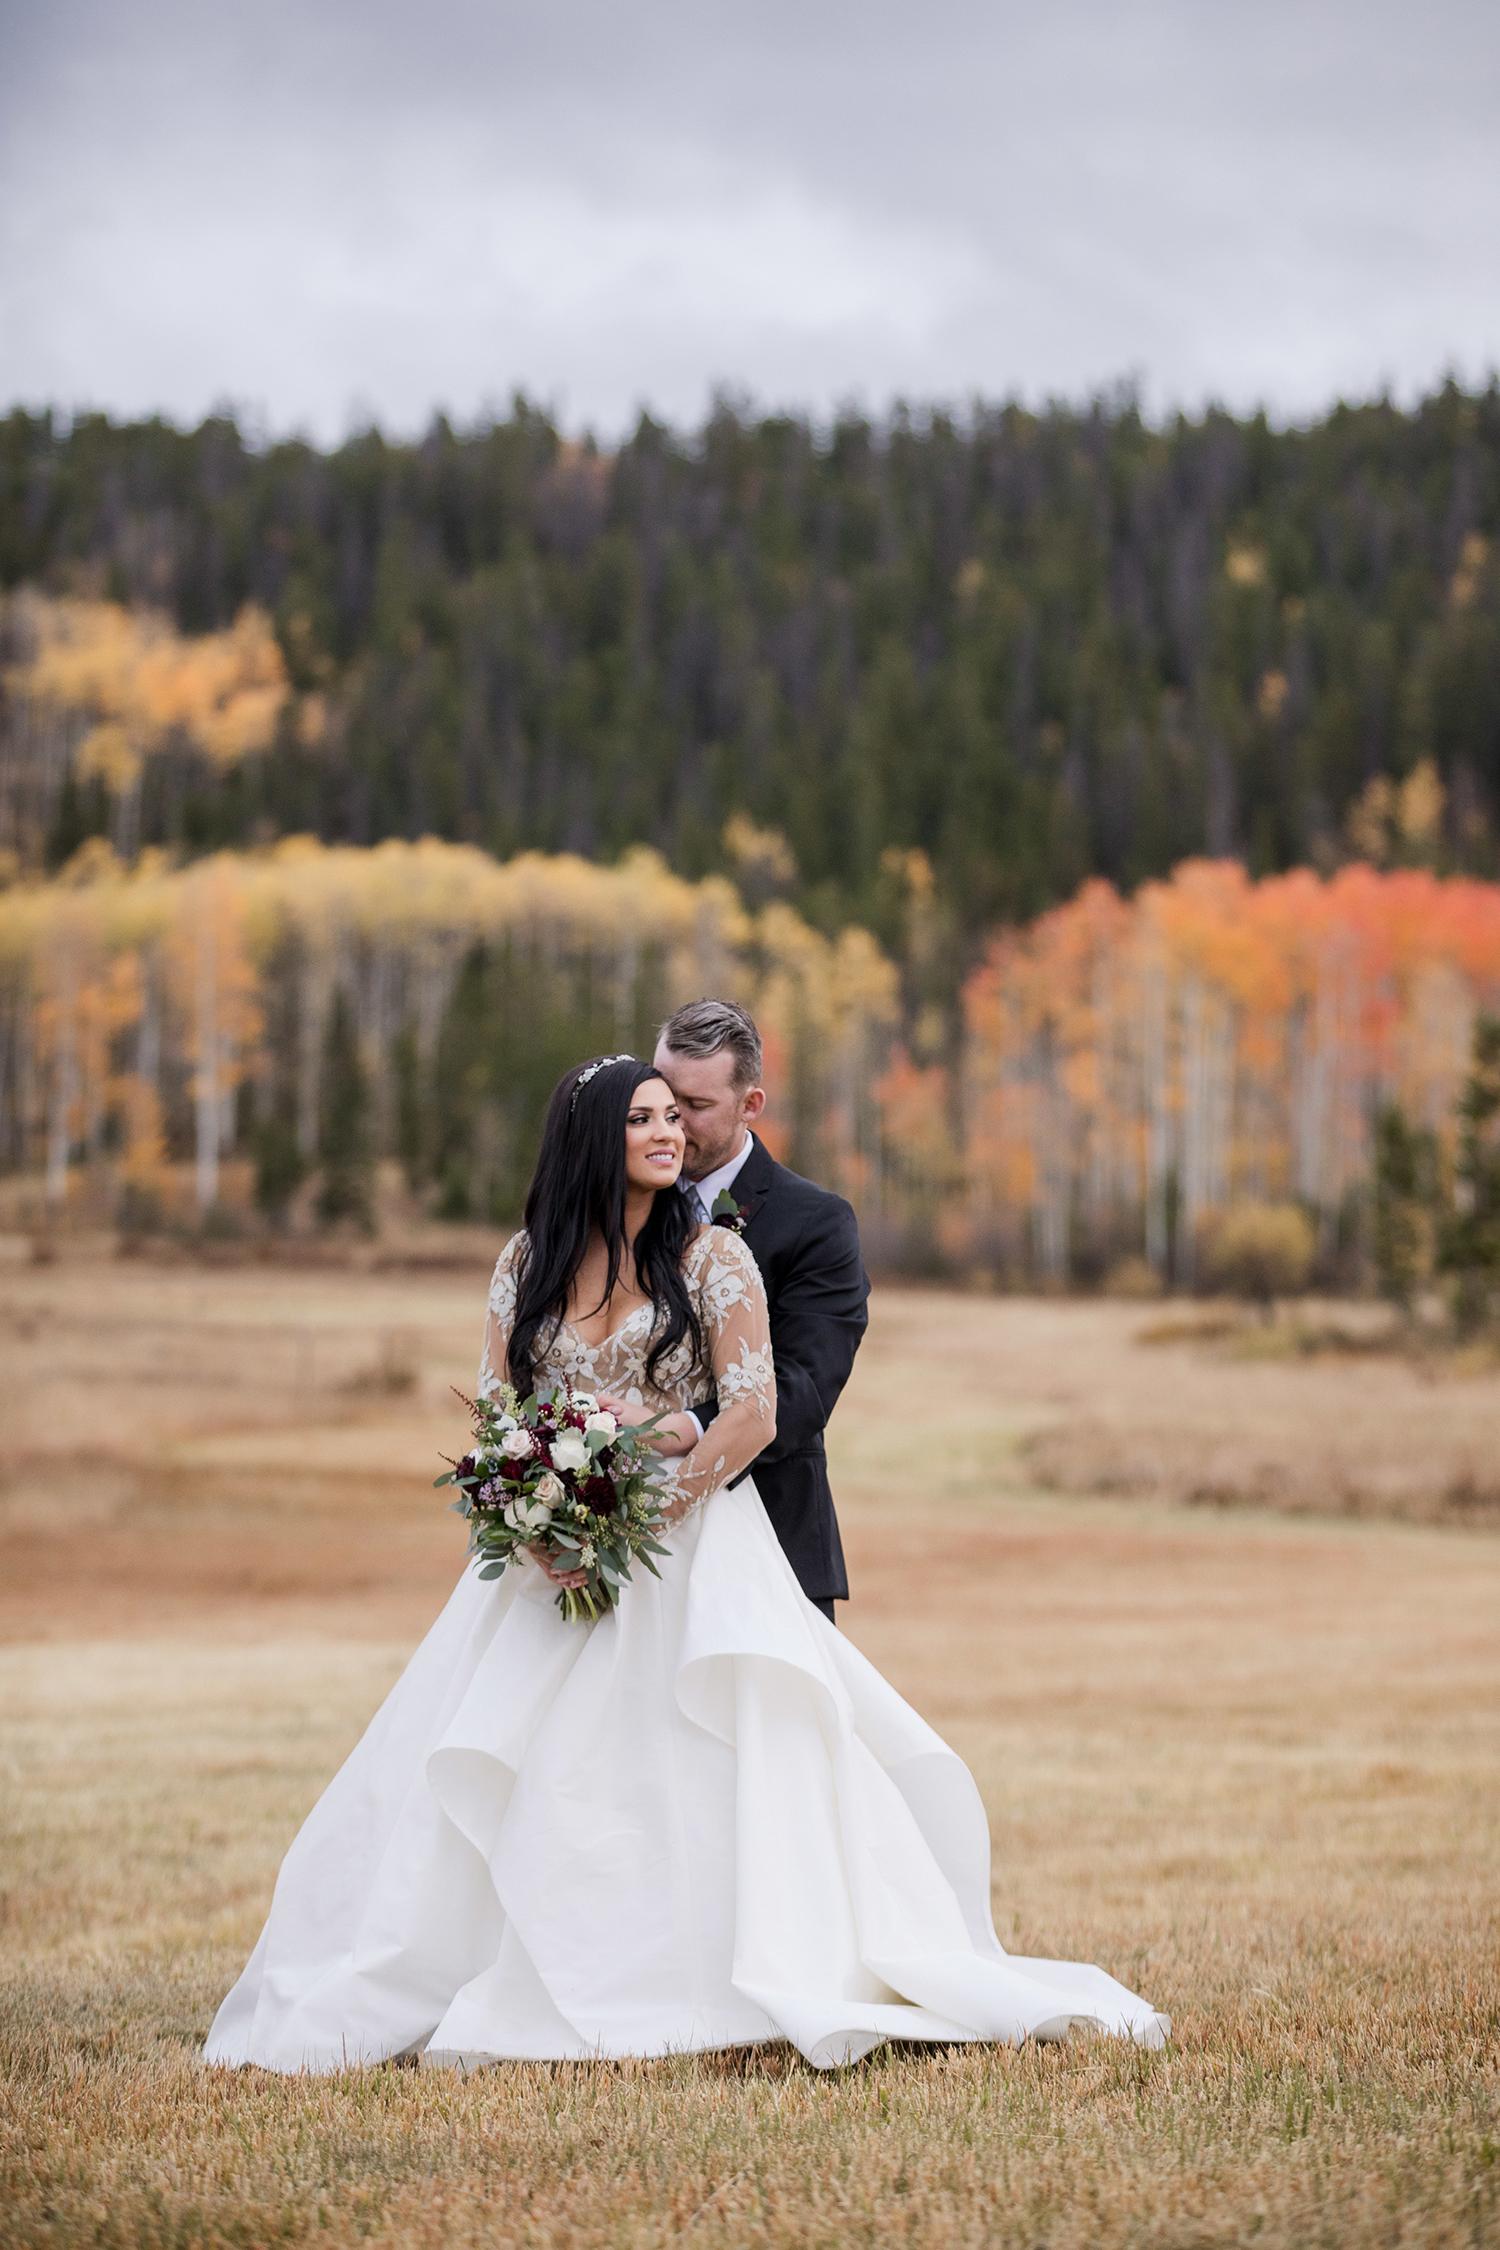 Rustic-Elegant-Mountain-Wedding-01.jpg